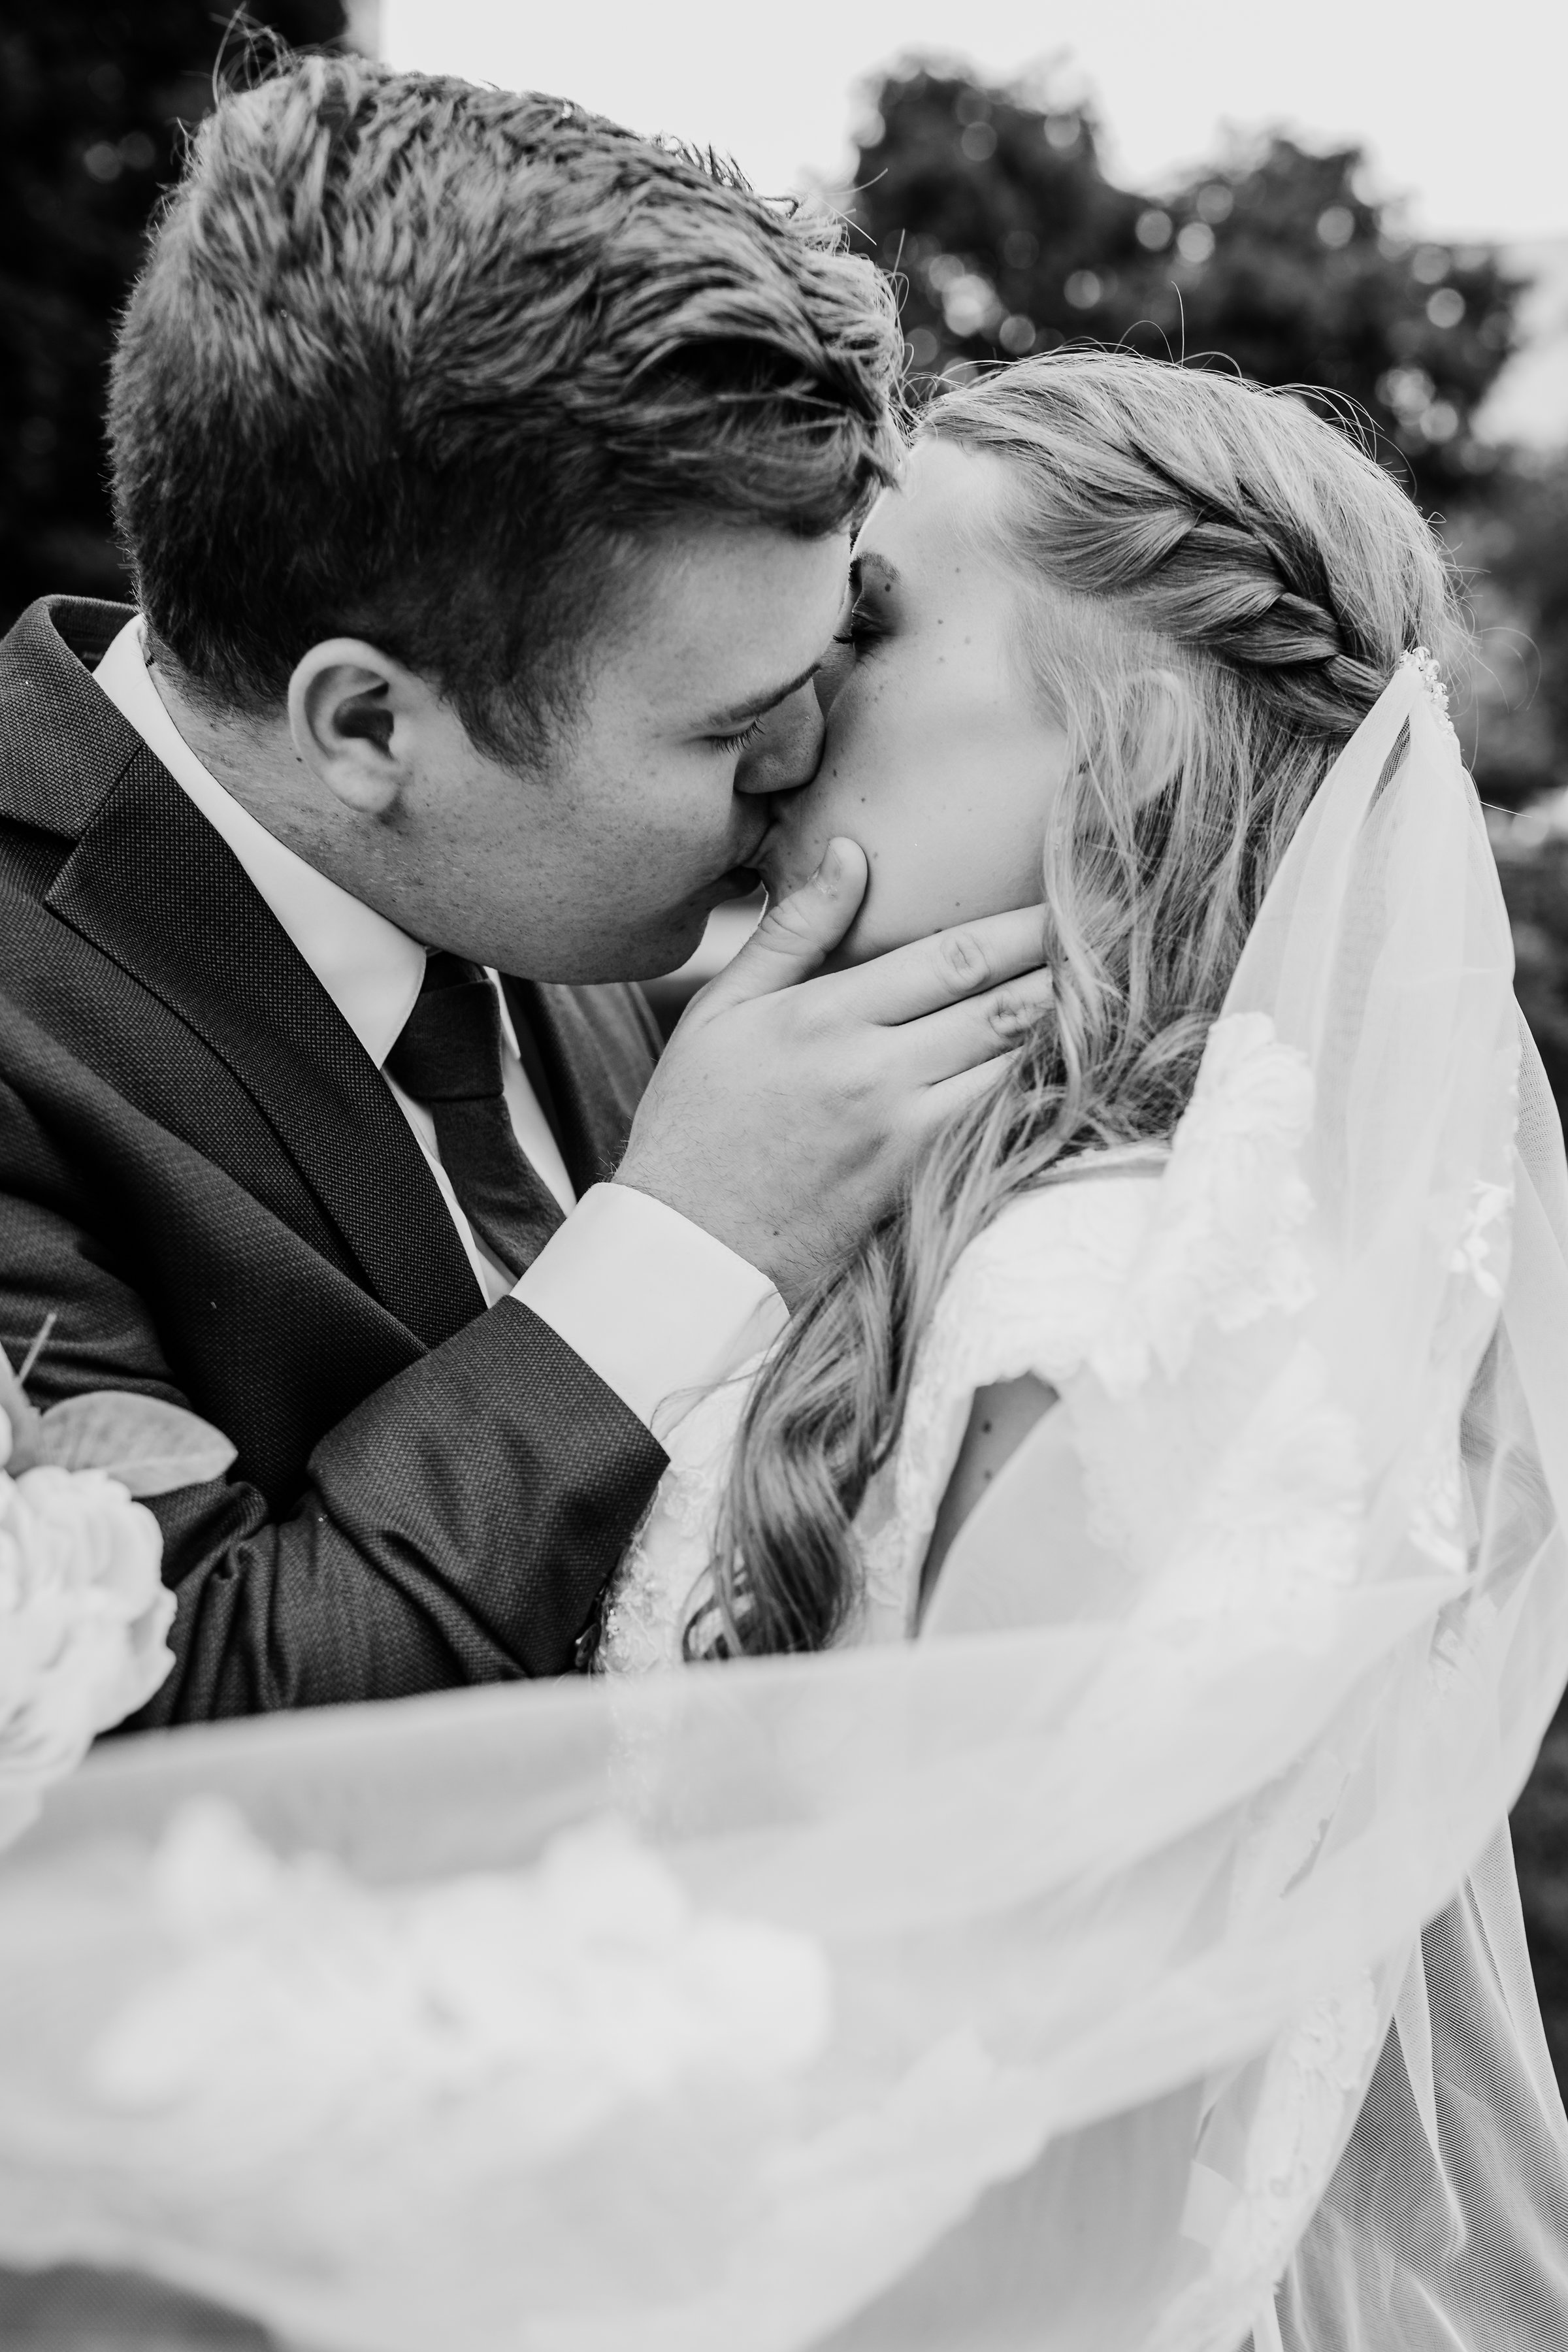 best wedding photographer in lakewood colorado kissing bride and groom billowy wedding veil lds